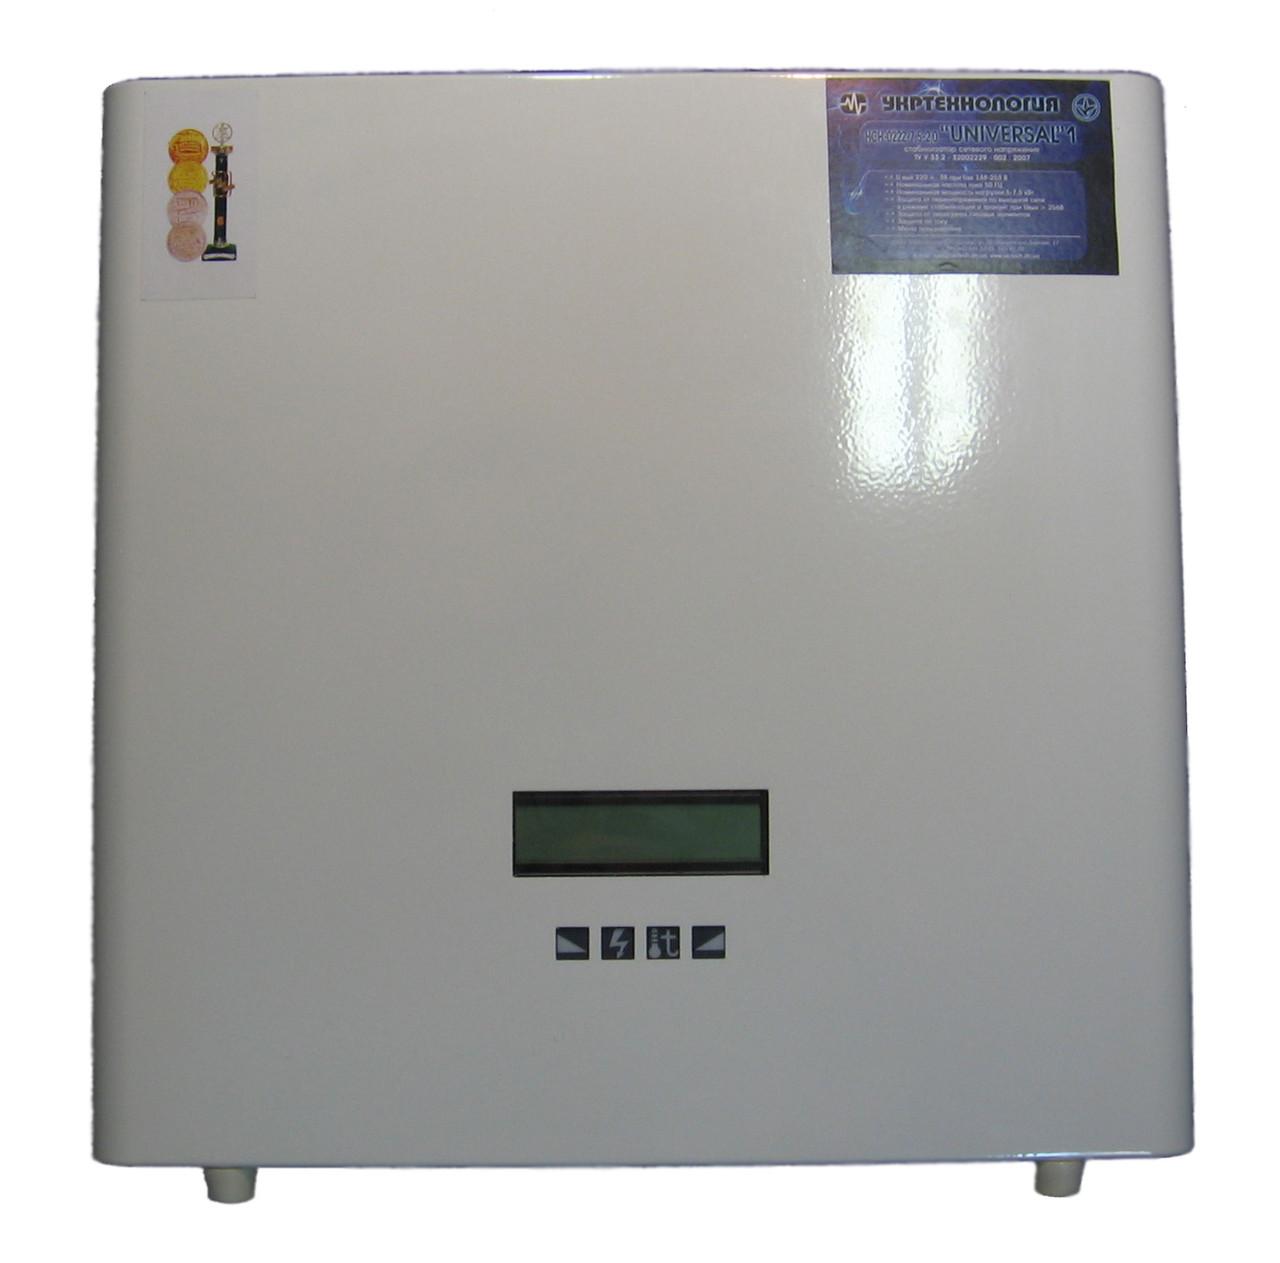 Стабілізатор напруги Universal НСН 5000 HV (5 кВт)